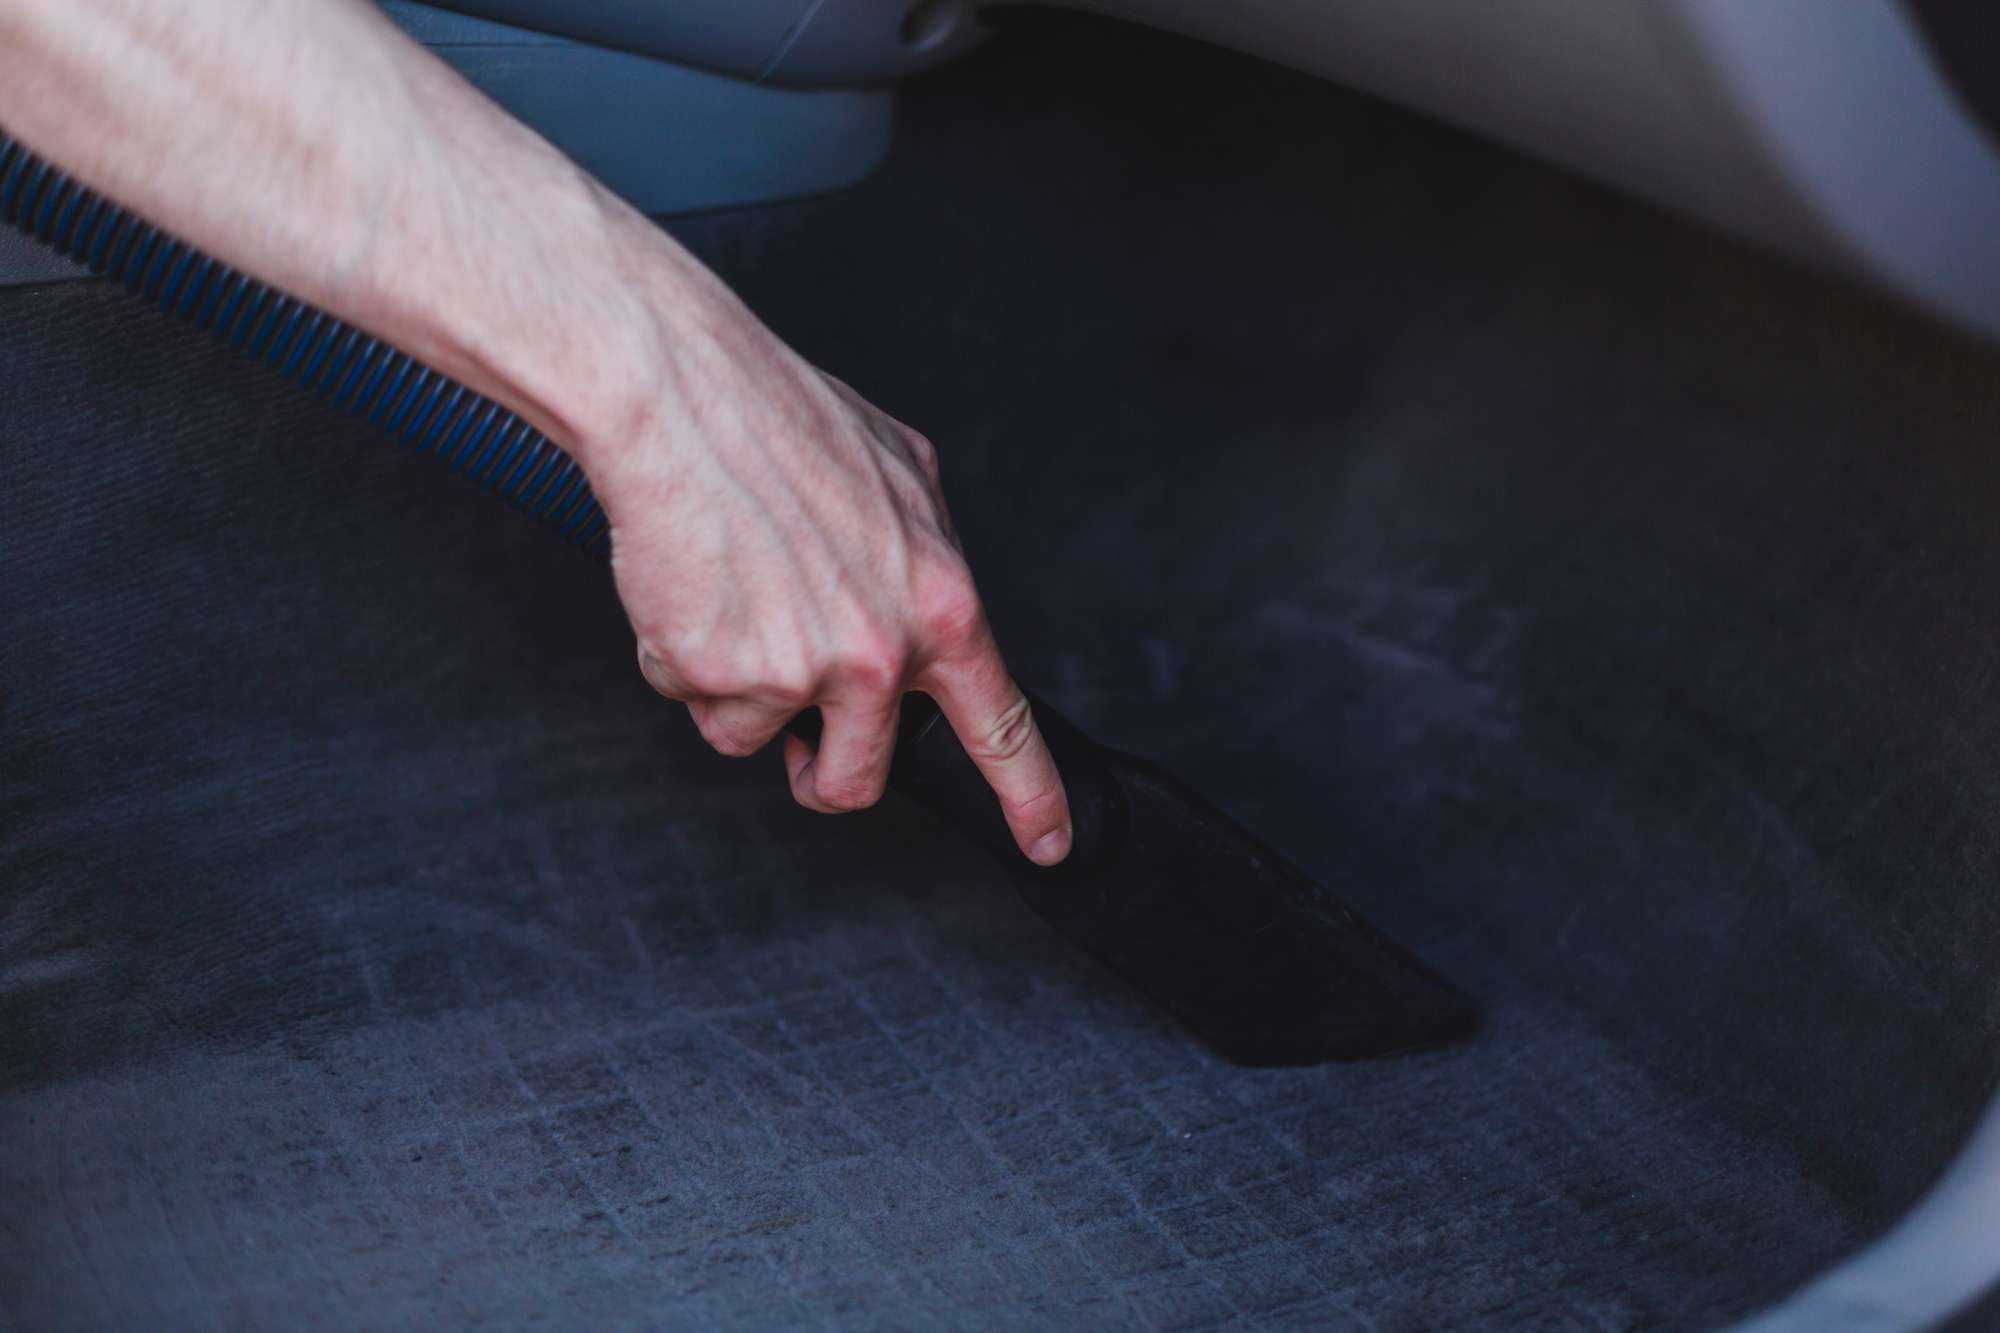 man cleans carpets in car